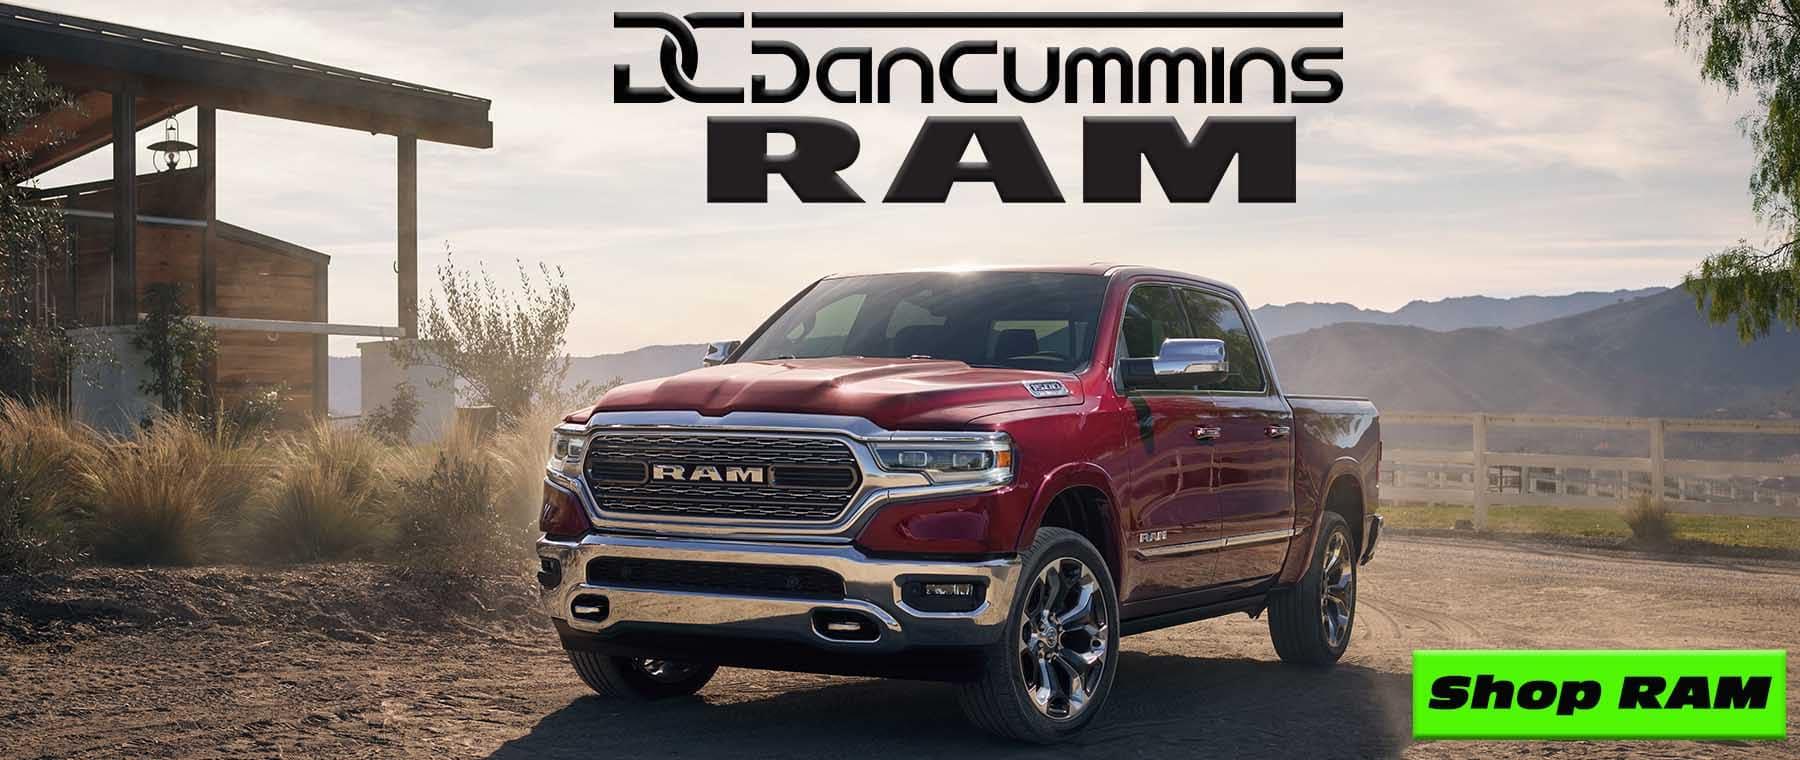 Dan Cummins Ram Truck Dealer